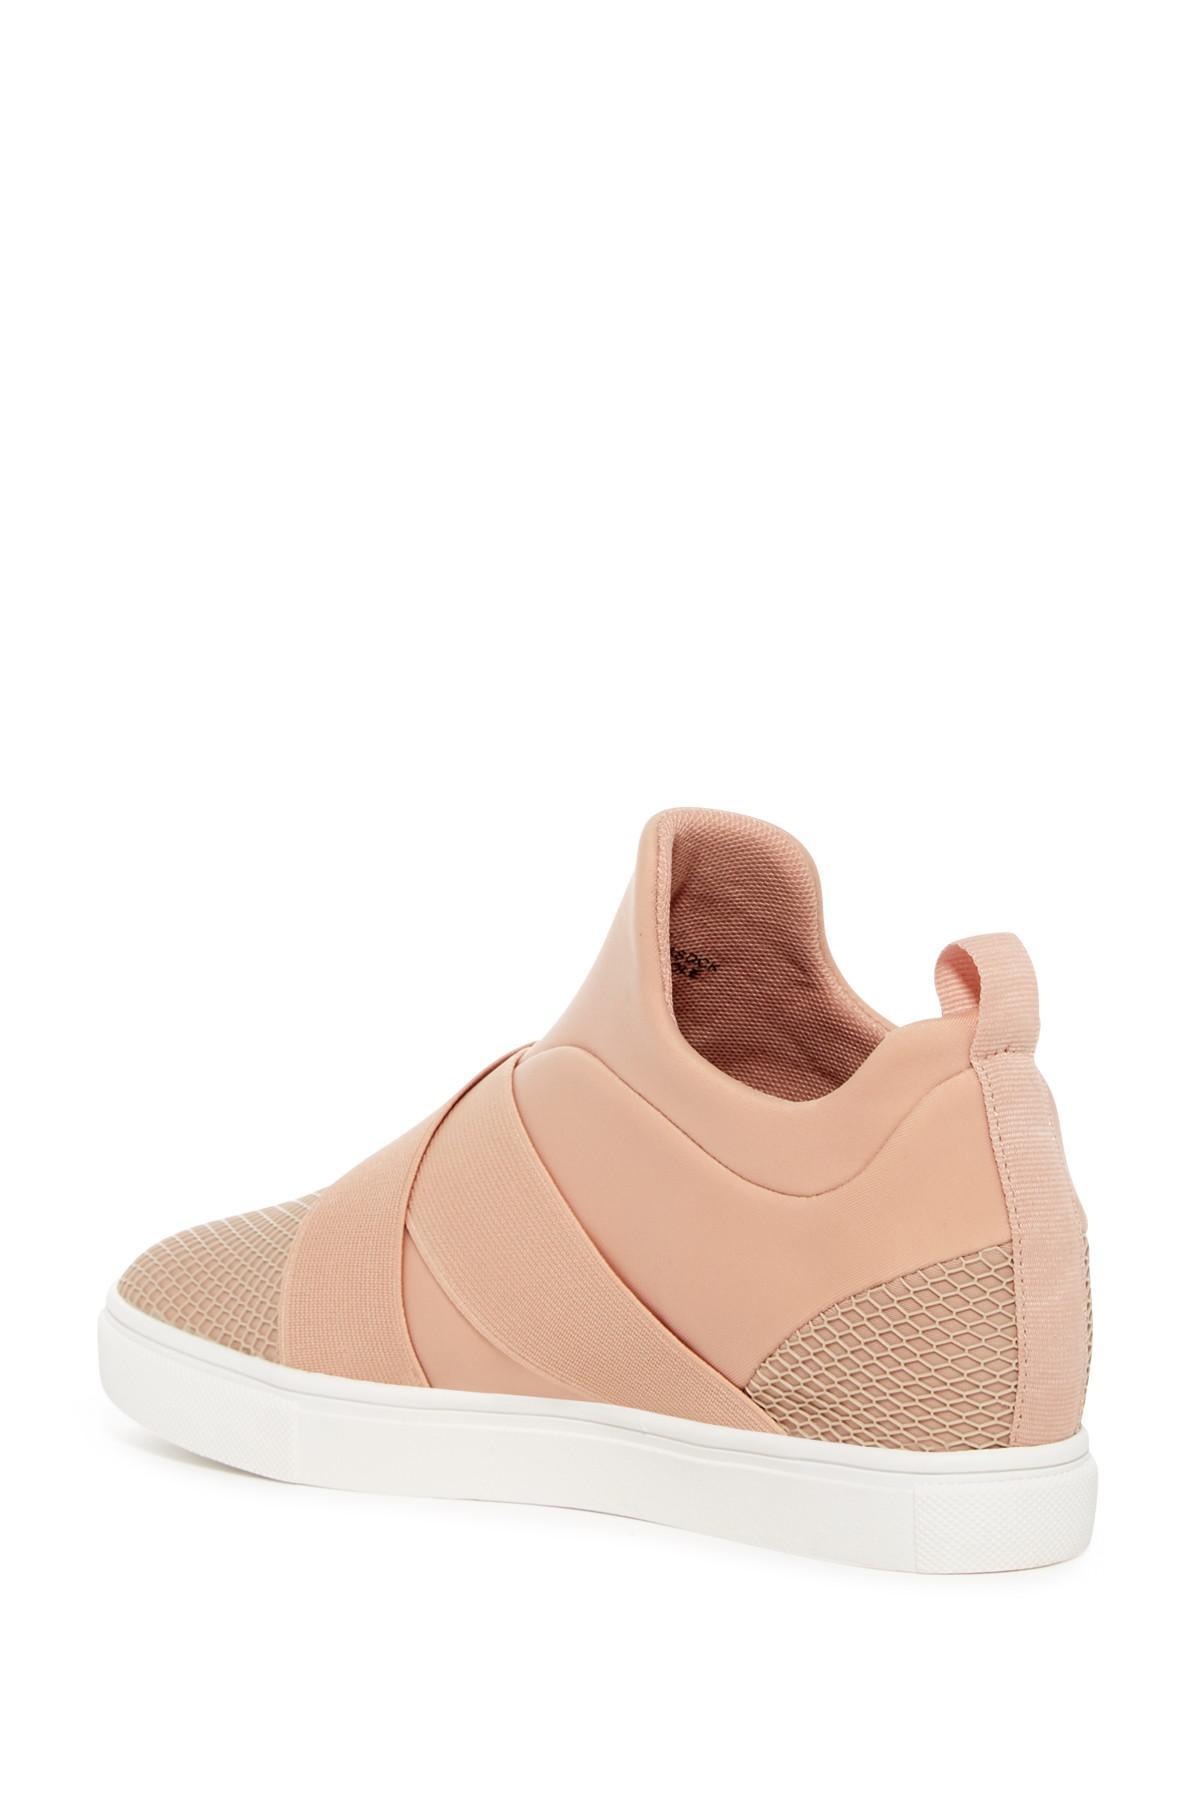 20b23382351 Steve Madden Multicolor Laynie Sneaker